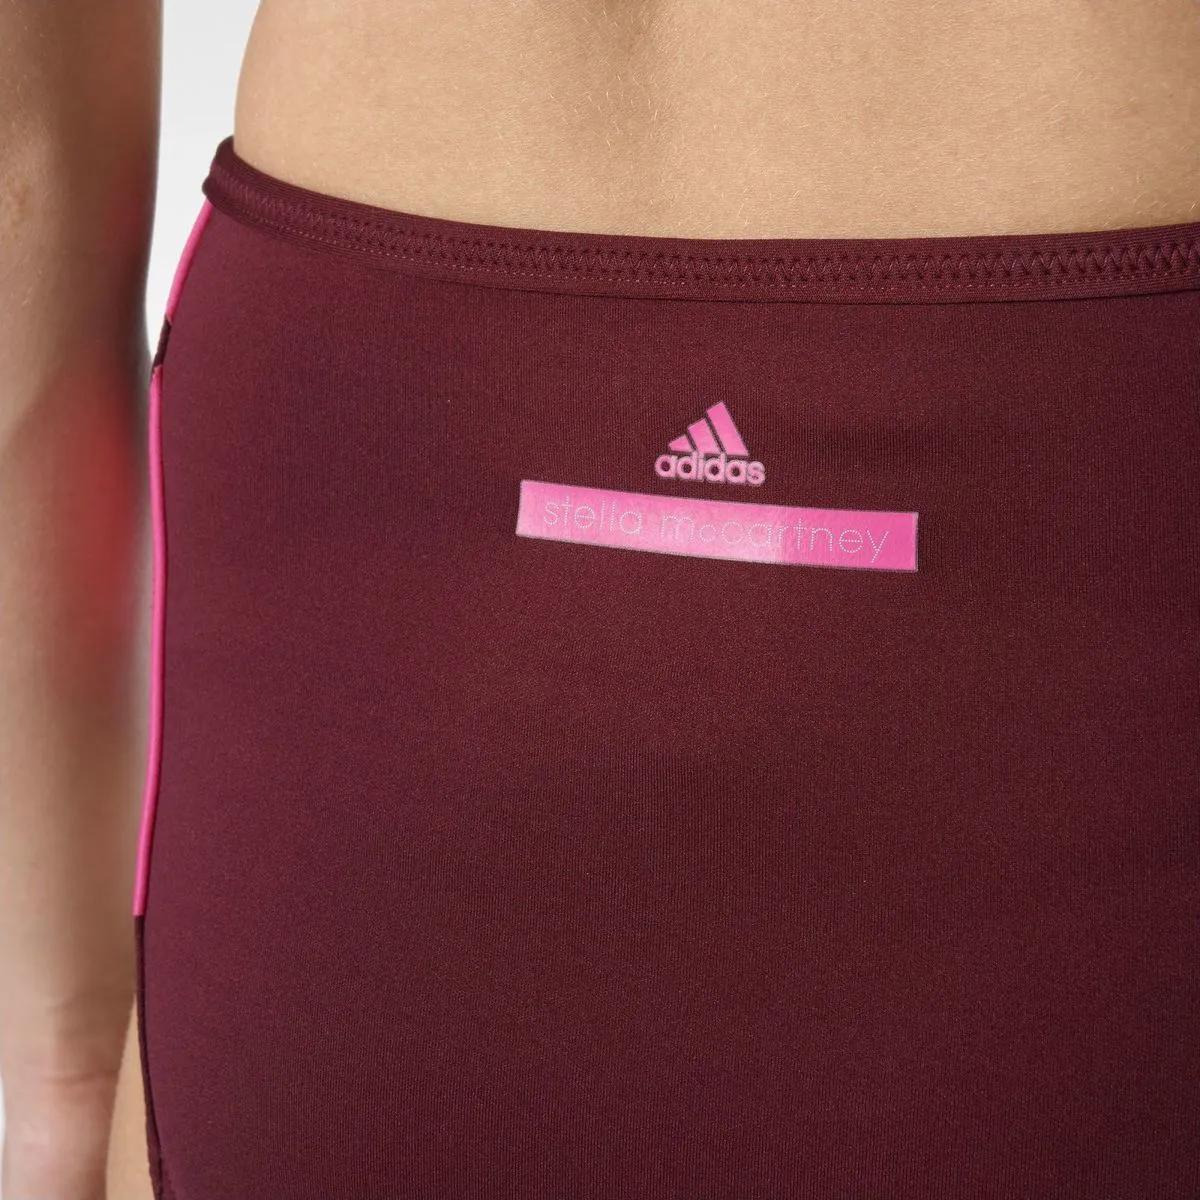 Sunquini Adidas Stella Mccartney Shorts Esportivo Moda Praia